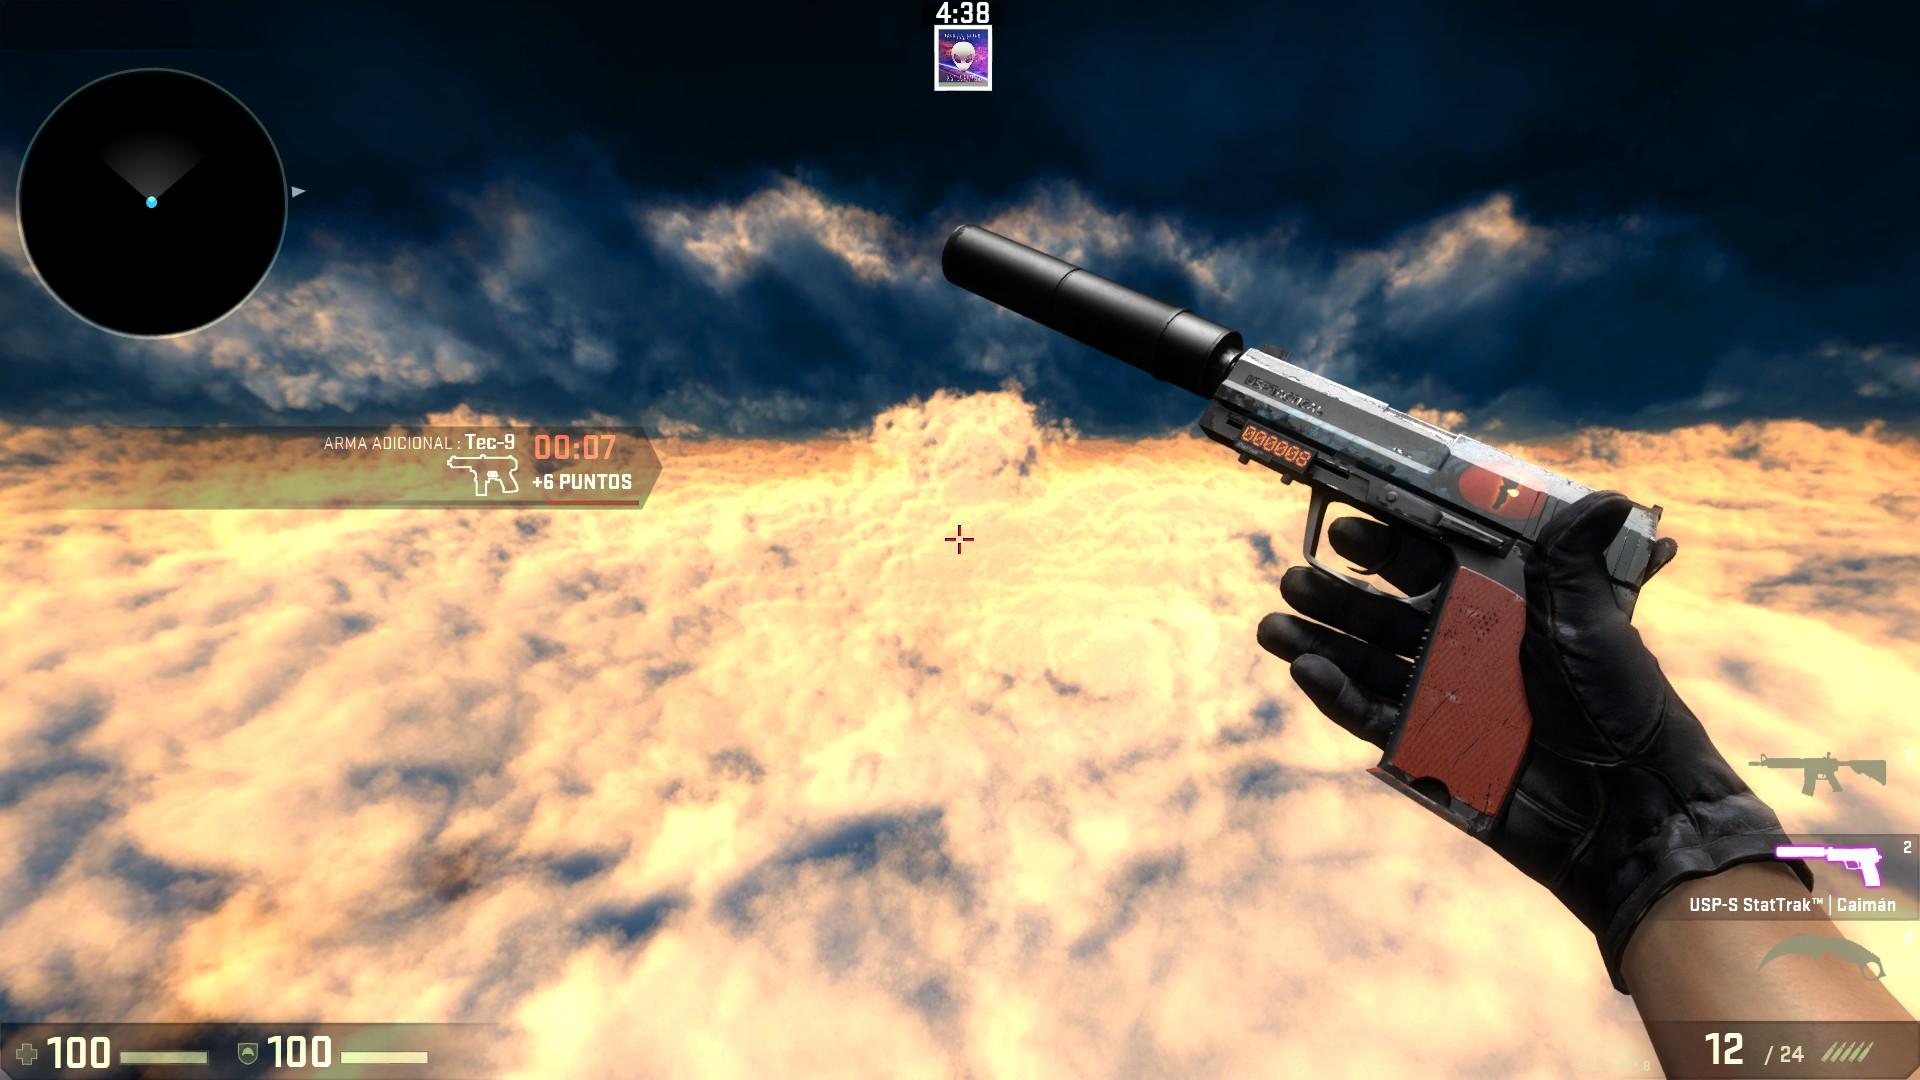 steam community screenshot usp caiman ft whit mw float